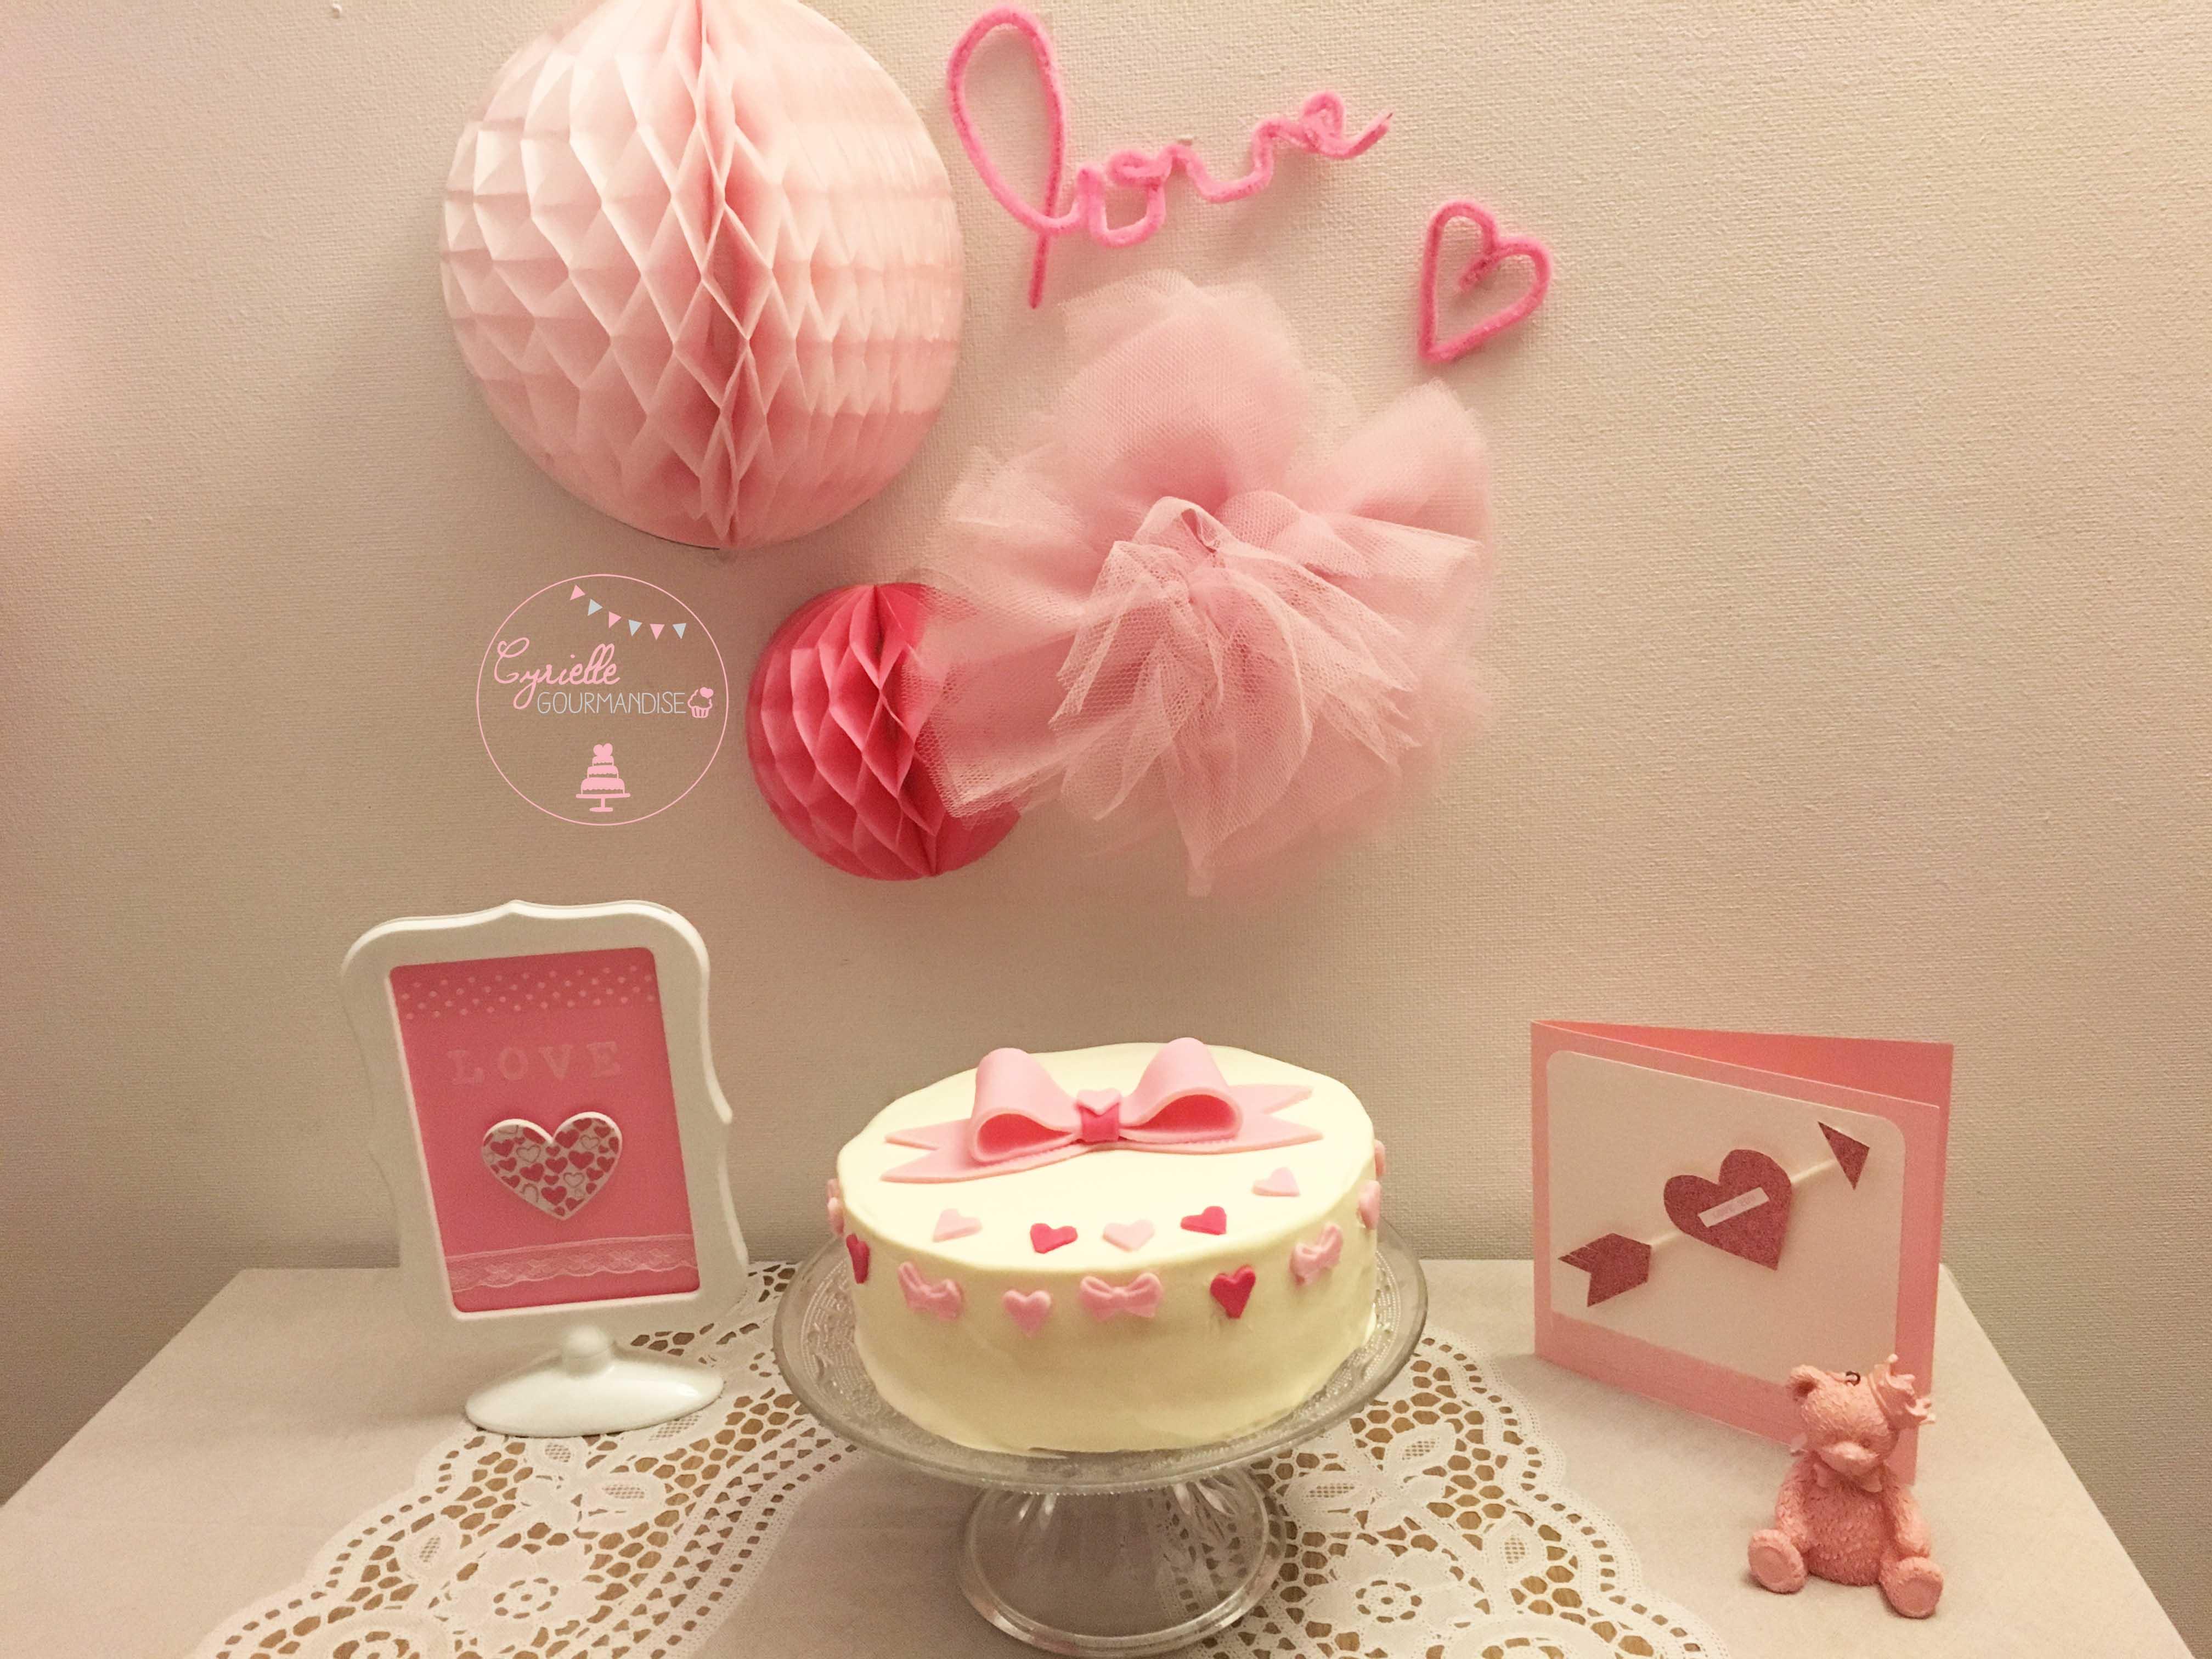 Love Cake Surprise 5